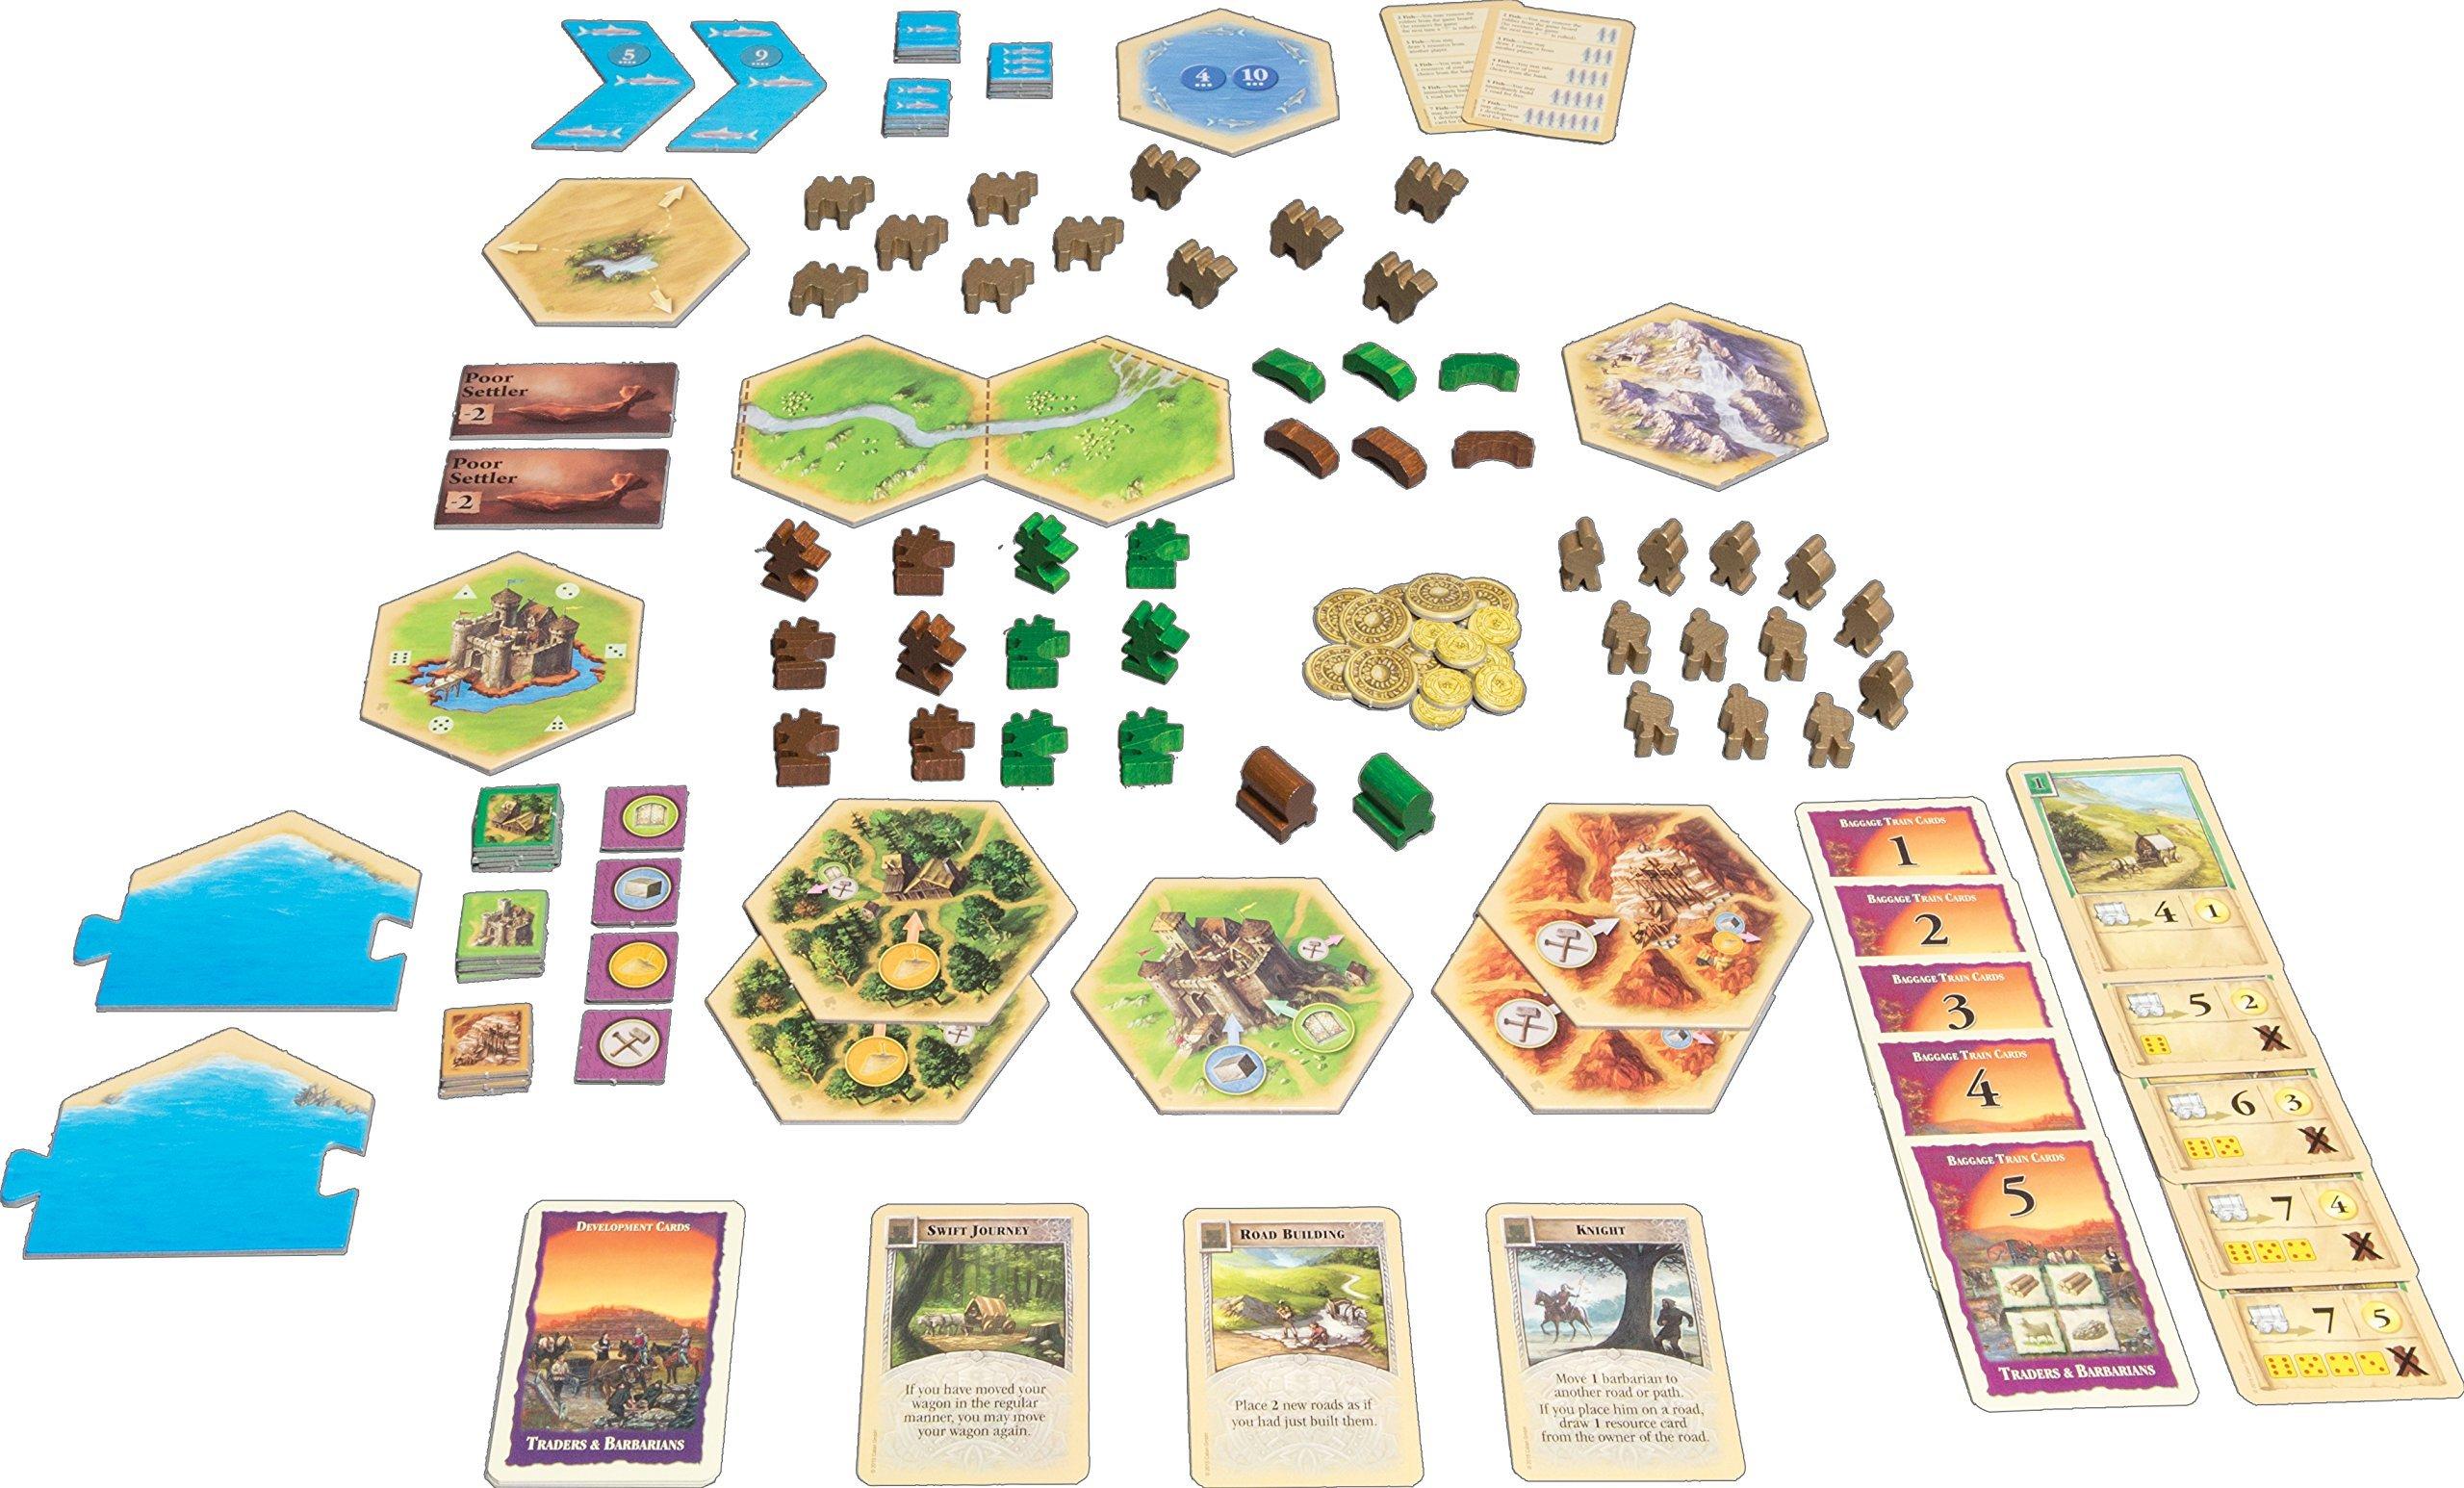 Mayfair Catan: Traders and Barbarians 5-6 Player Extension: Amazon.es: Juguetes y juegos